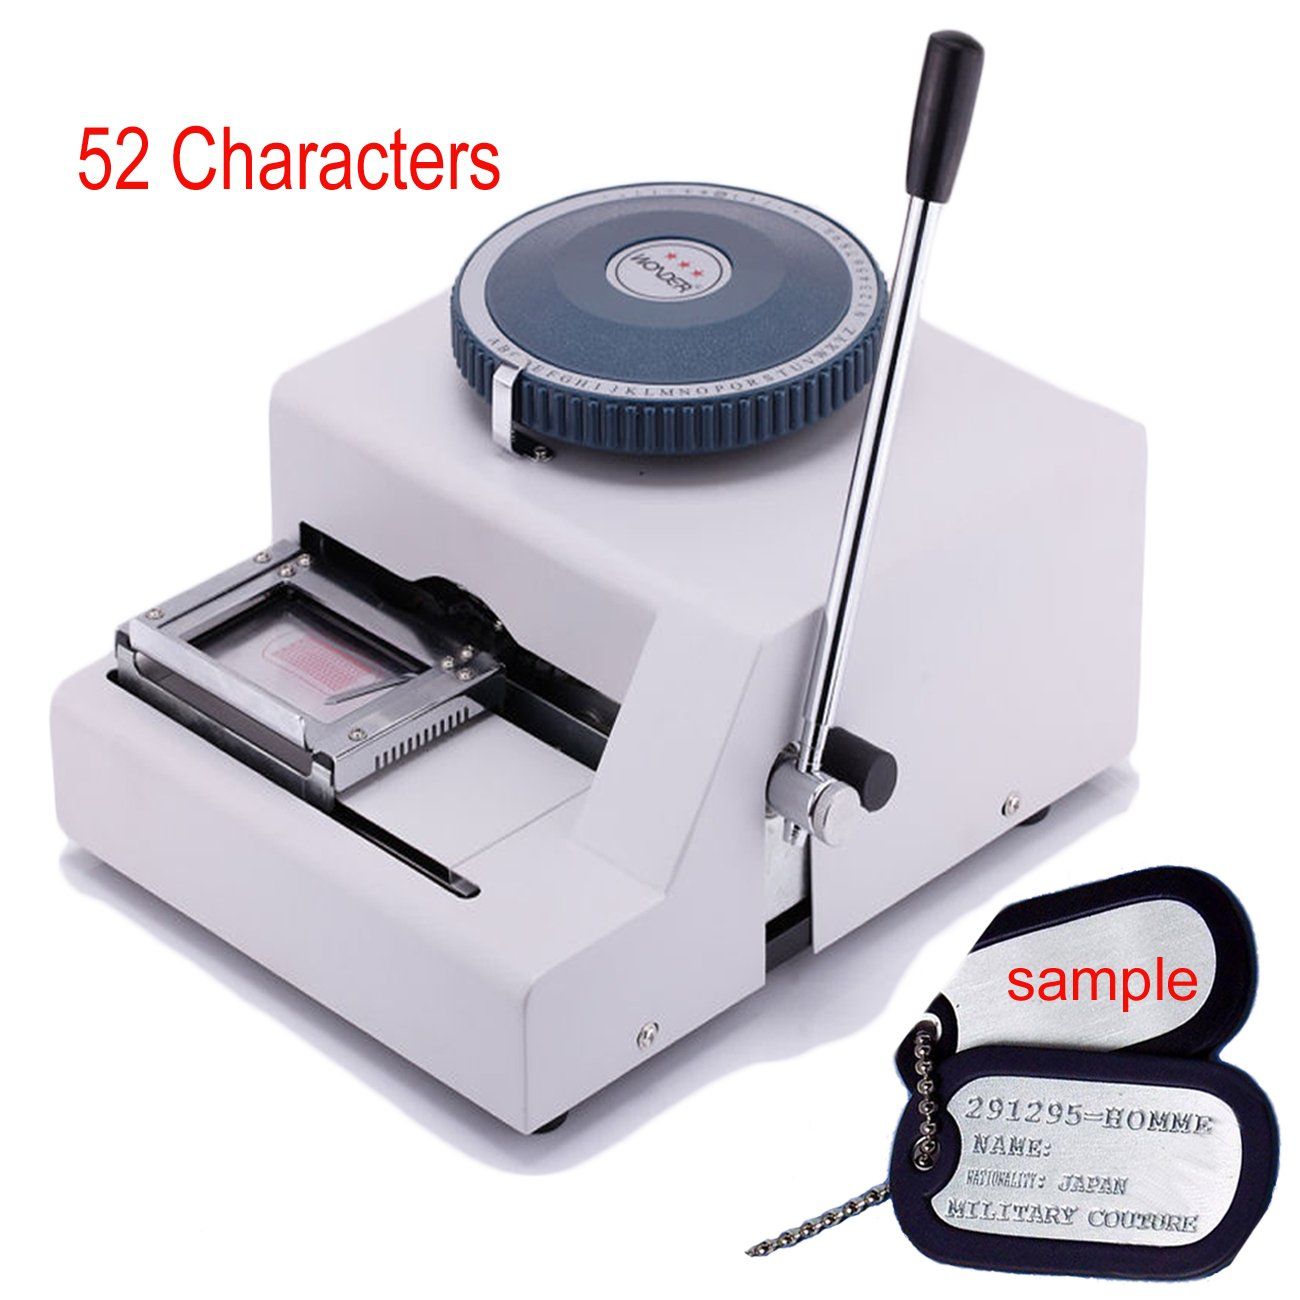 Ridgeyard 52 Characters Manual Dog Tag Embosser Engraver 52 Code Dog ID Card Military Embossing Stamping Machine by Ridgeyard